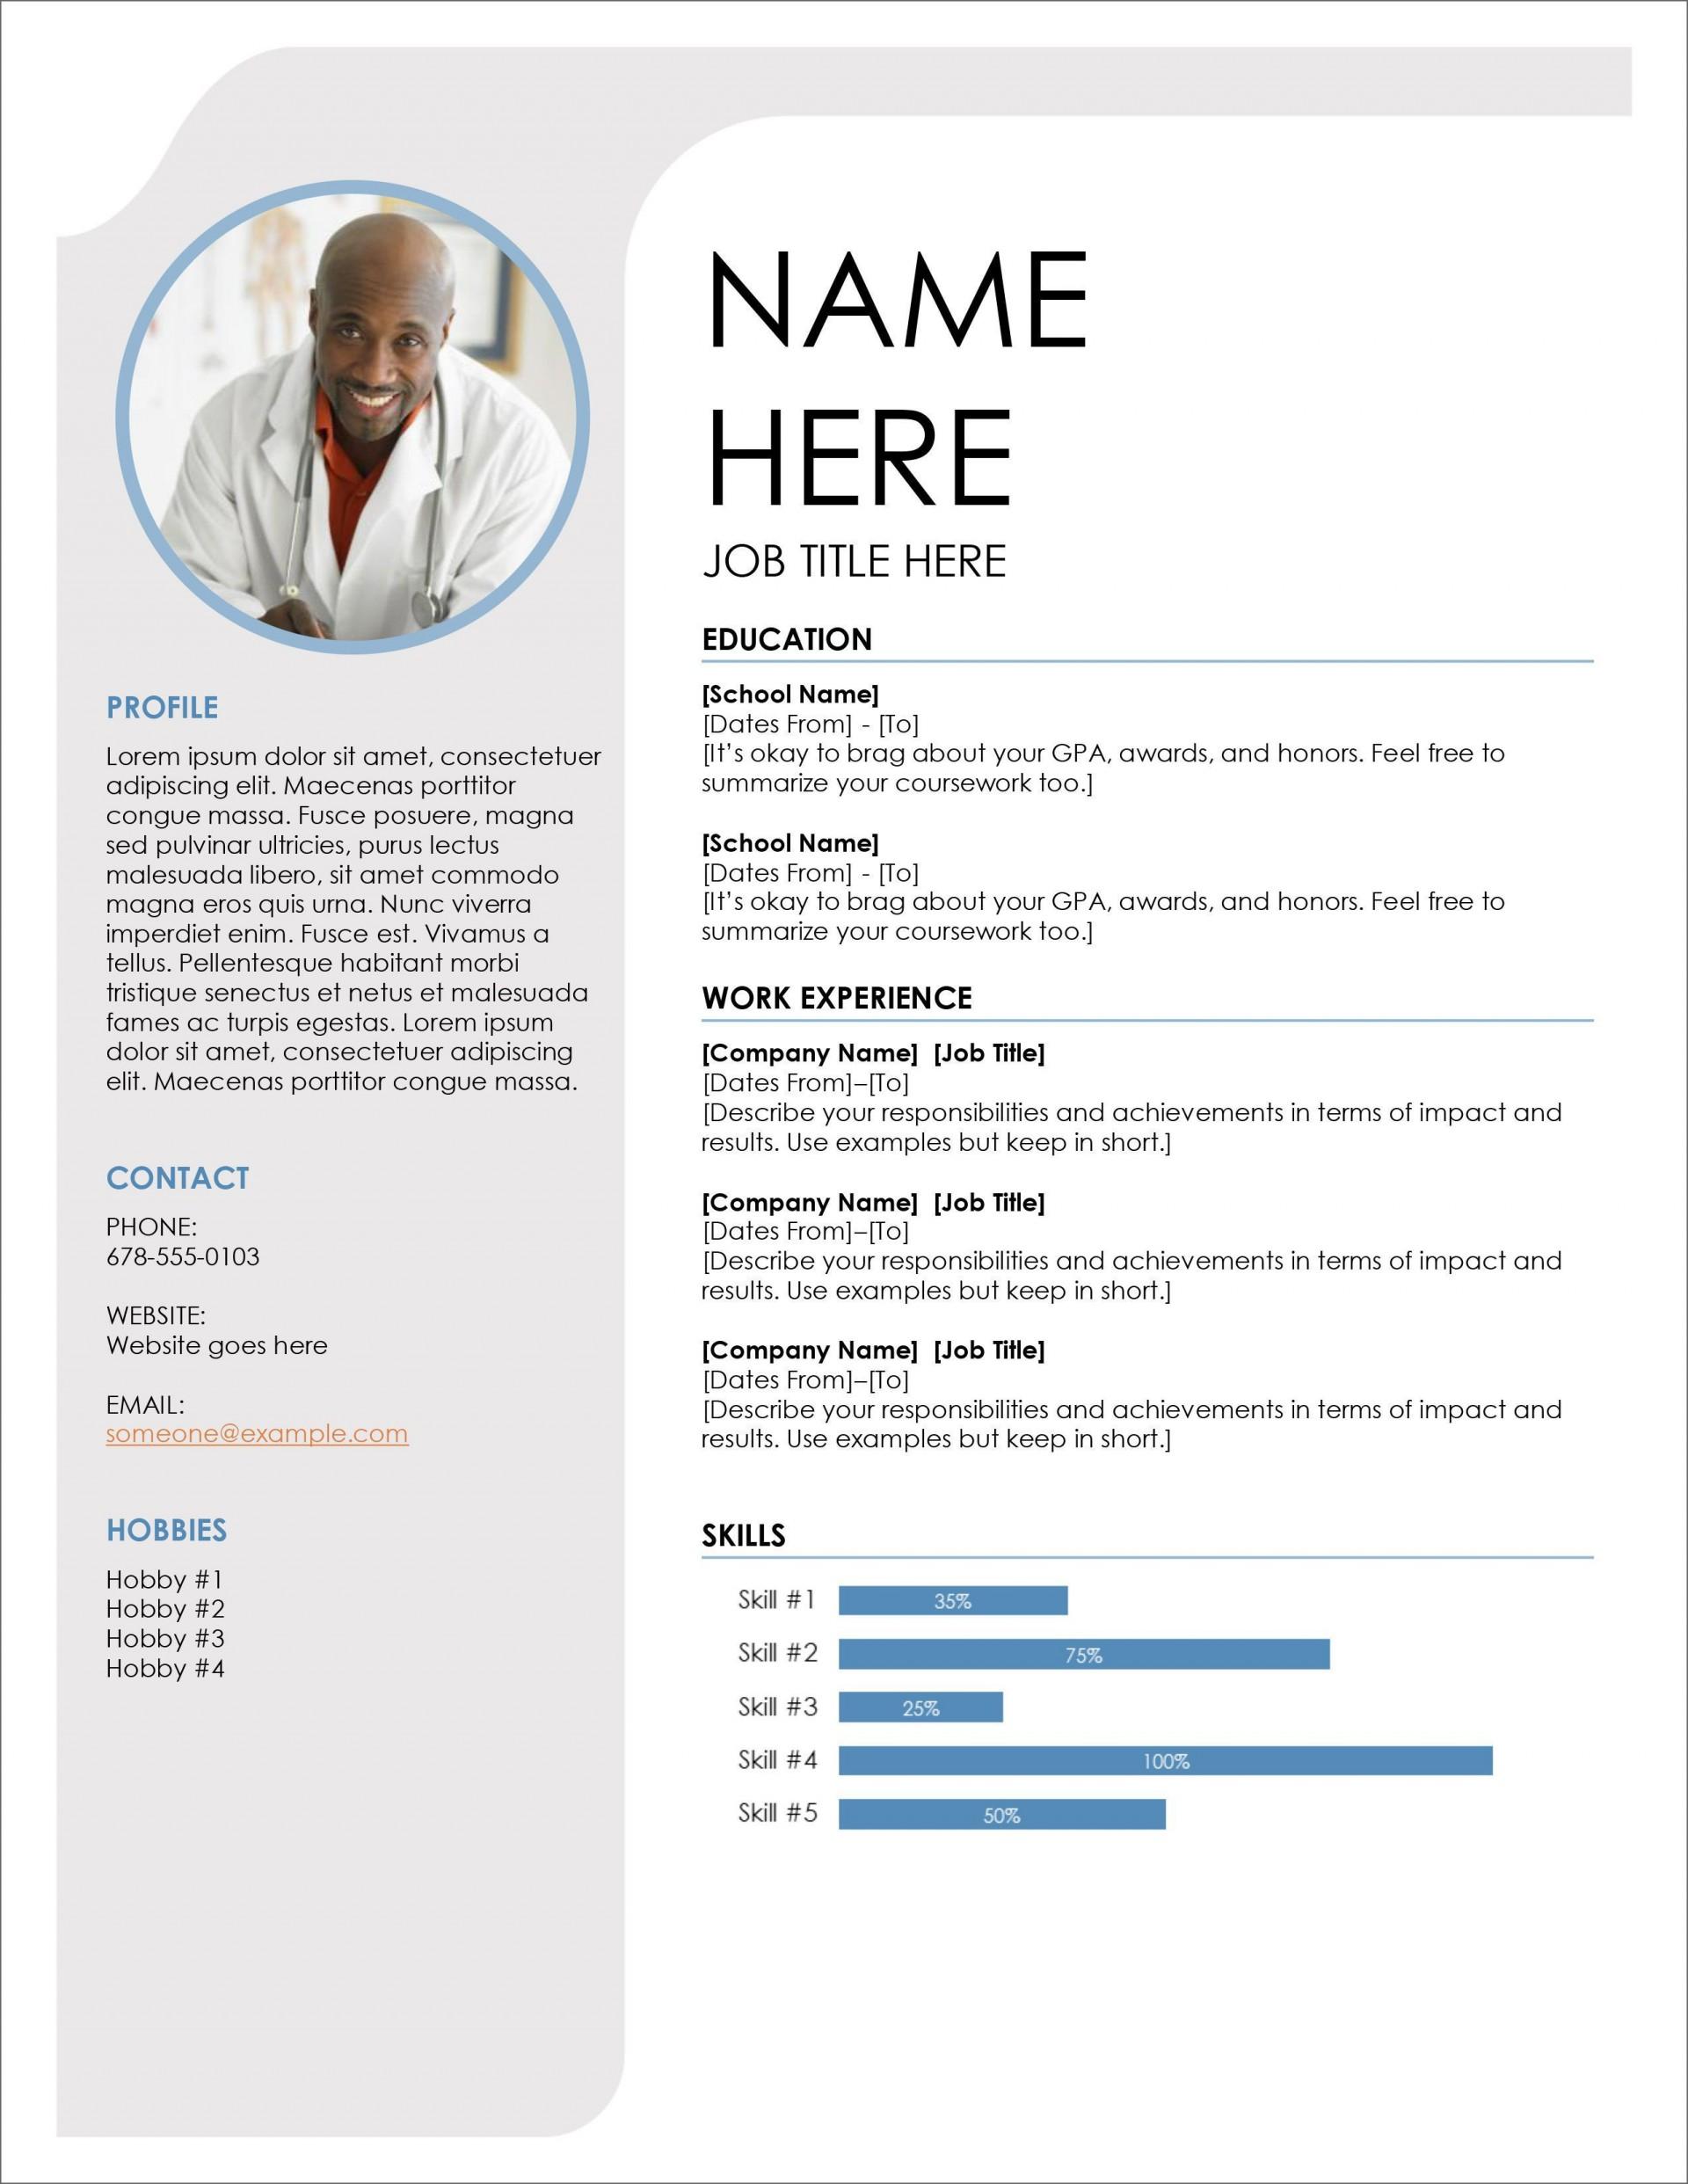 007 Amazing Resume Format Example Free Download Idea 1920